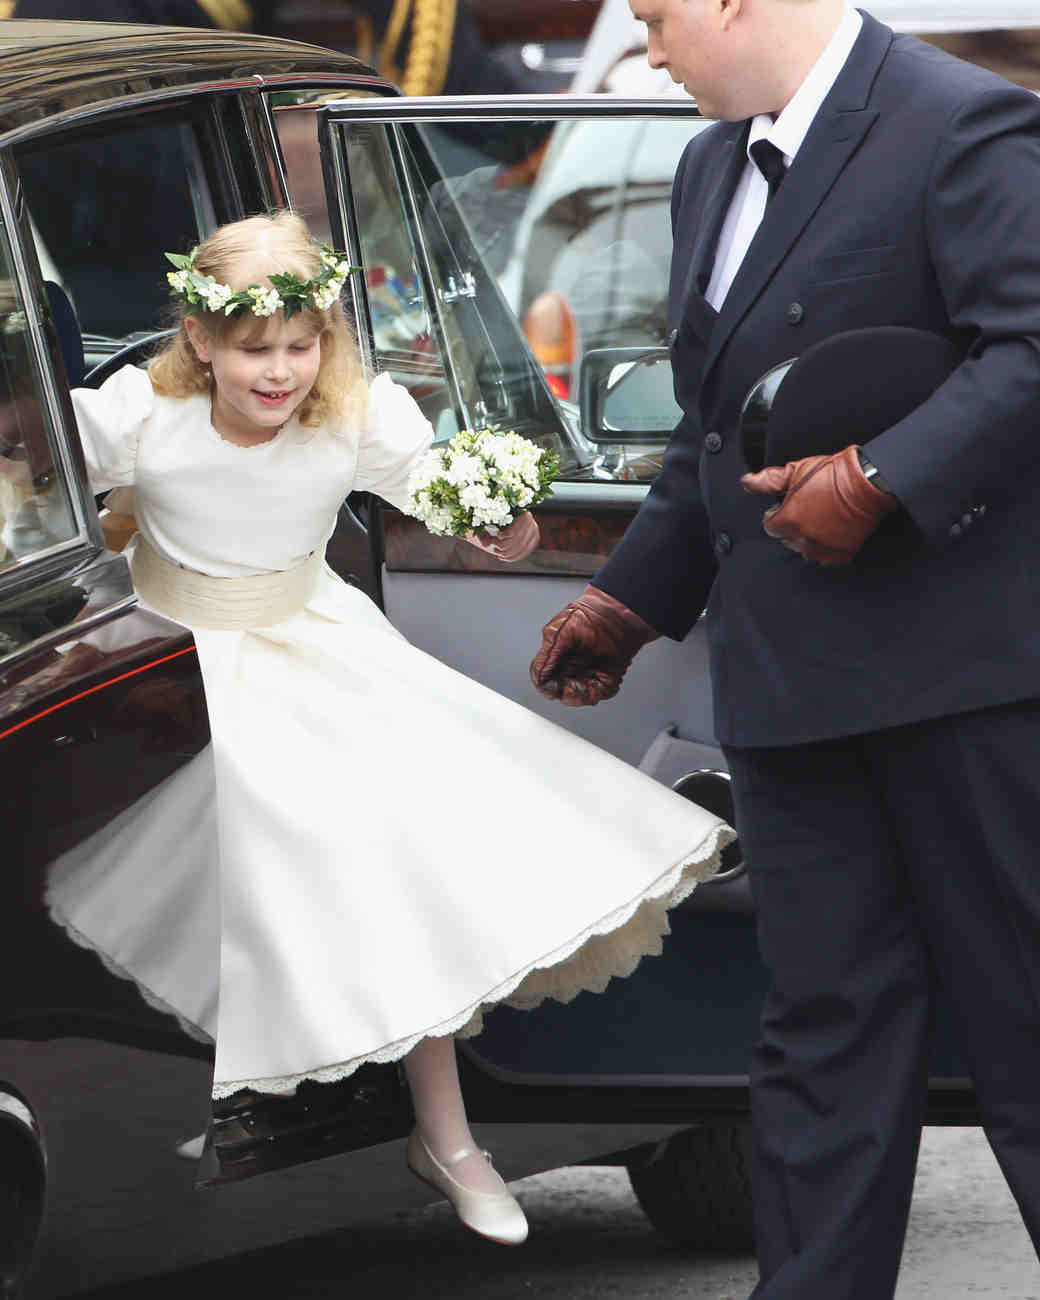 royal-children-wedding-113265466_master-0415.jpg